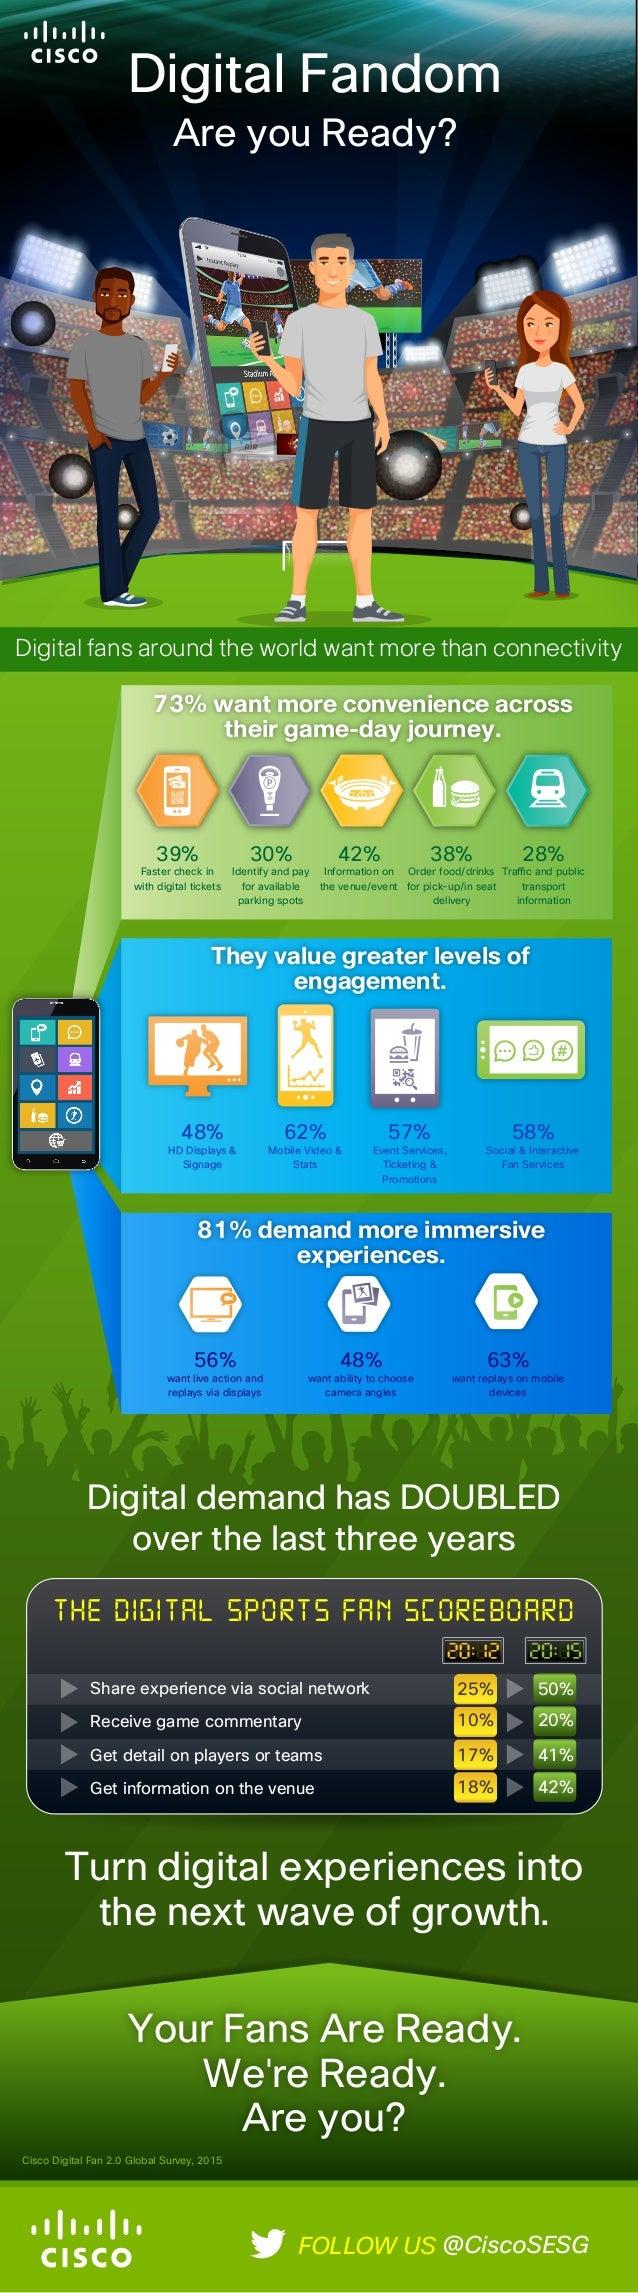 Digital Fandom Are you Ready? 10% 17% 18% 25% 20% 41% 42% 50% The Digital Sports Fan Scoreboard Share experience via socia...